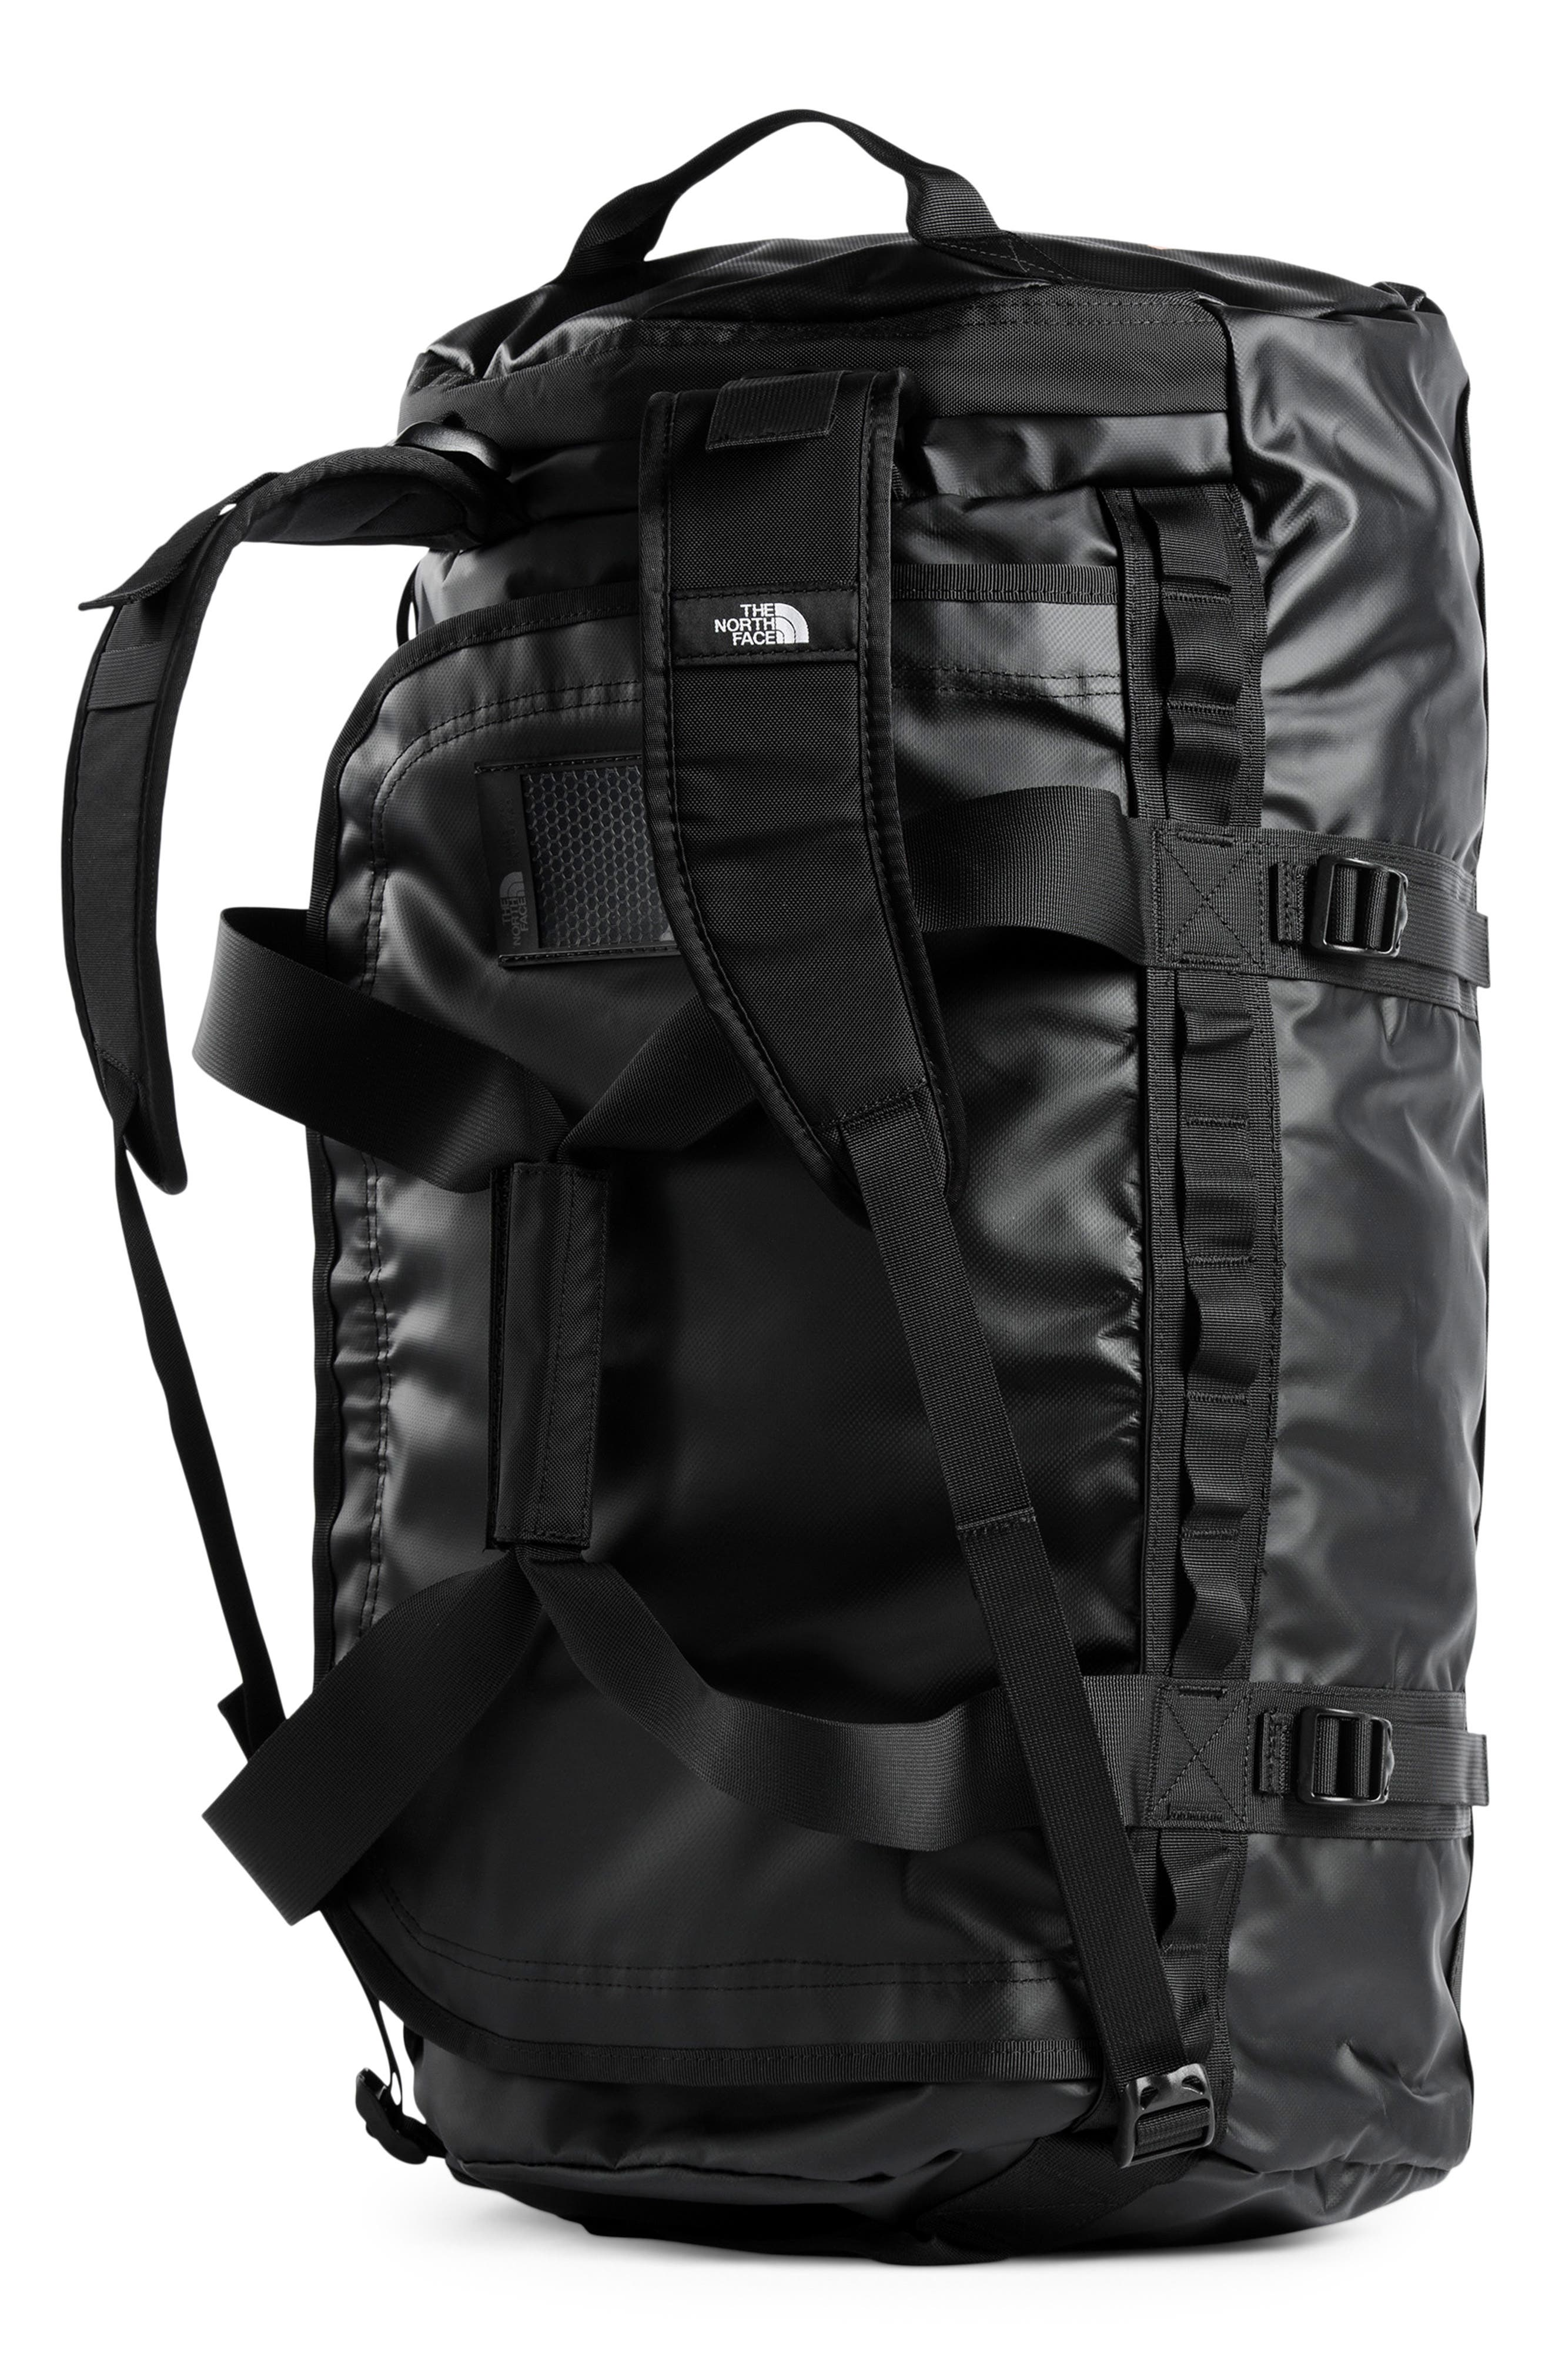 Base Camp Water Resistant Duffel Bag,                             Alternate thumbnail 3, color,                             TNF BLACK/ METALLIC COPPER